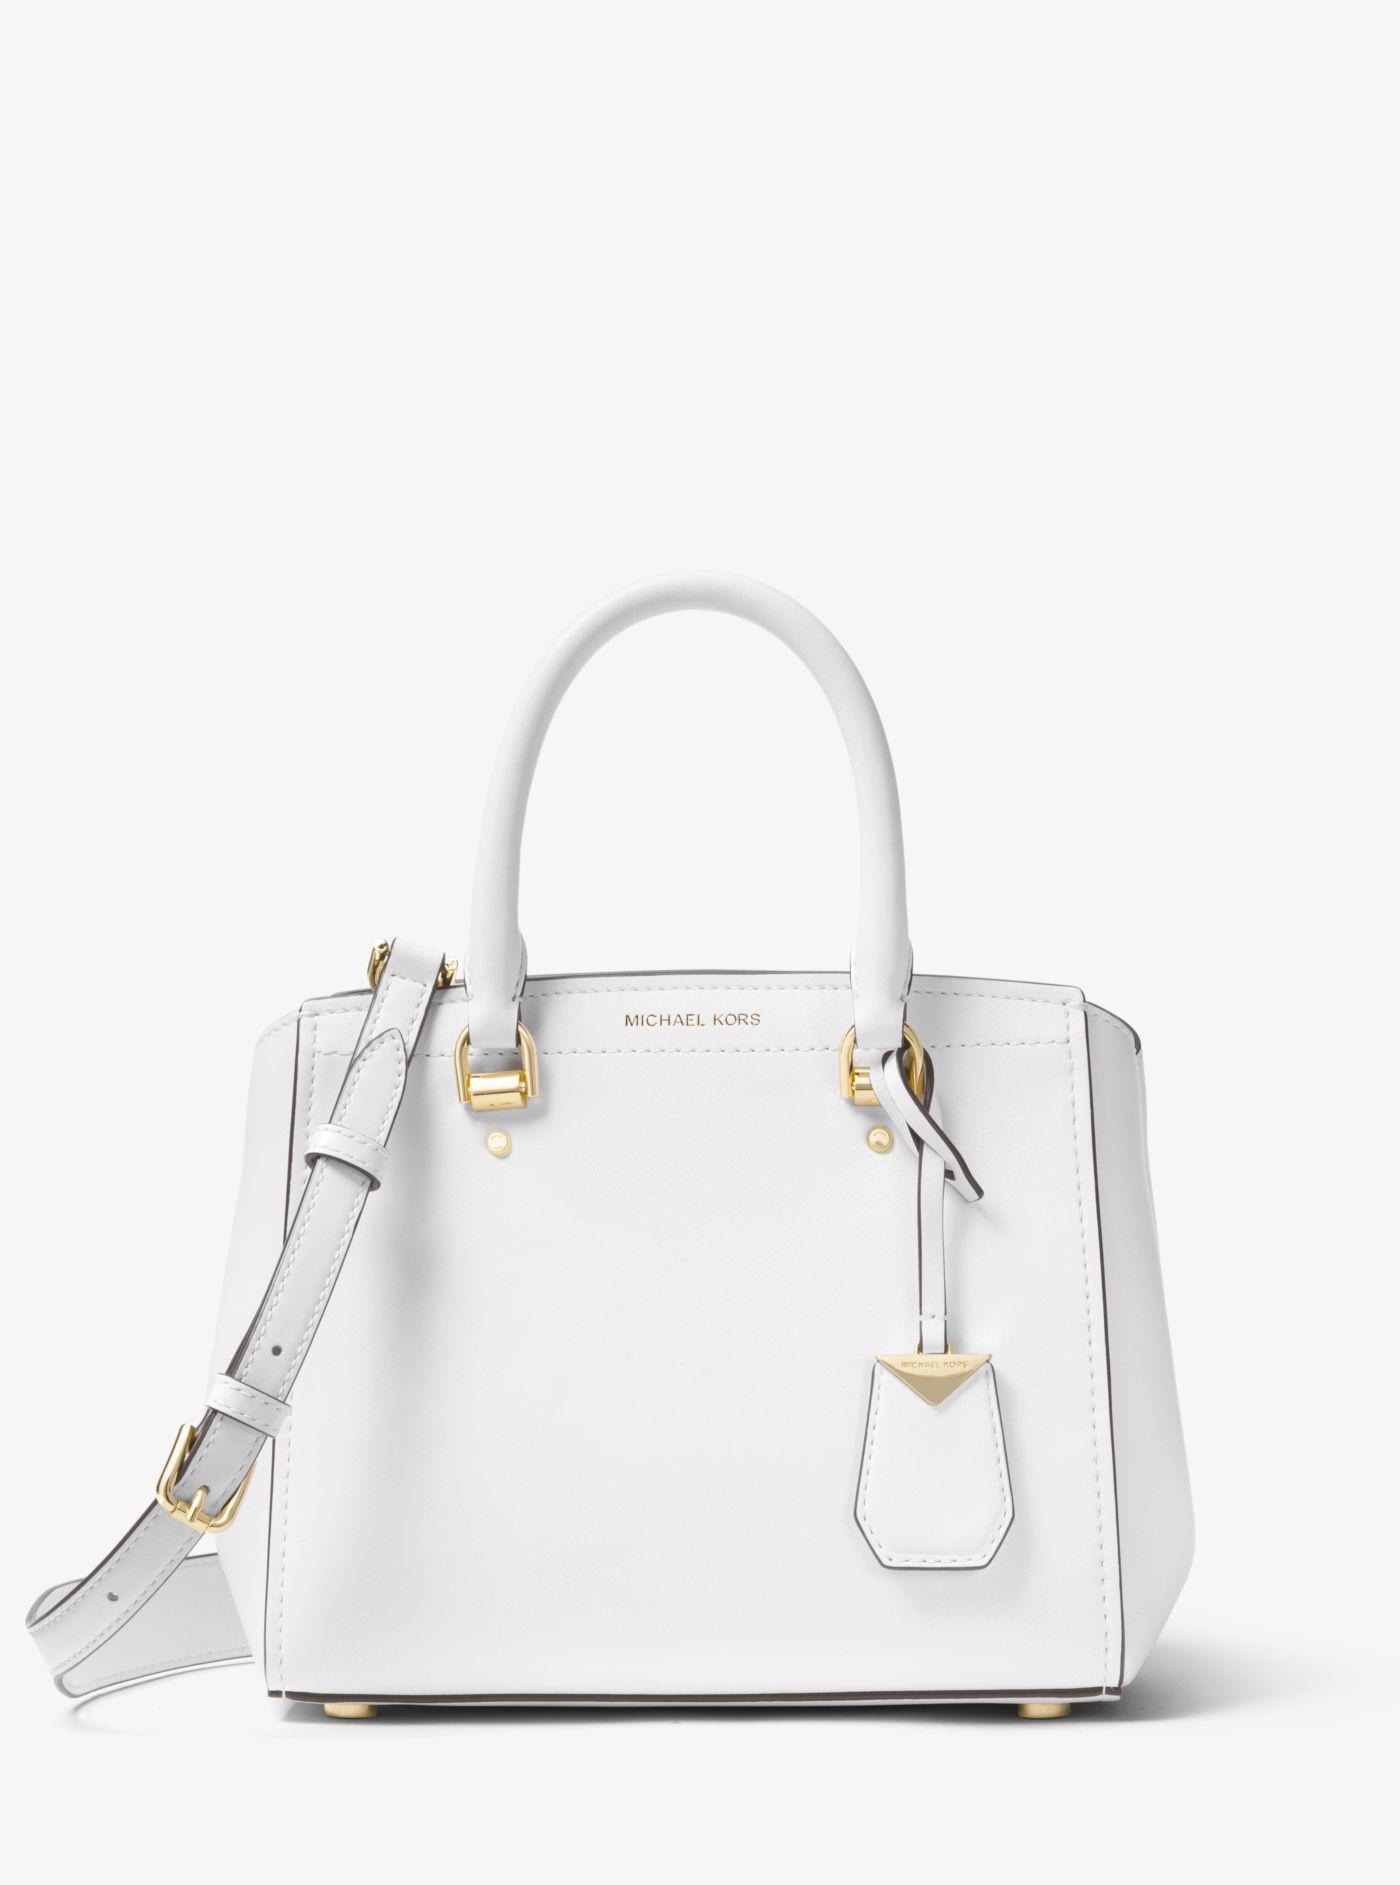 30ef71799100 ... pink b27e2 2cb70 low price michael kors white benning medium leather  satchel lyst. view fullscreen d96b6 9ca95 ...